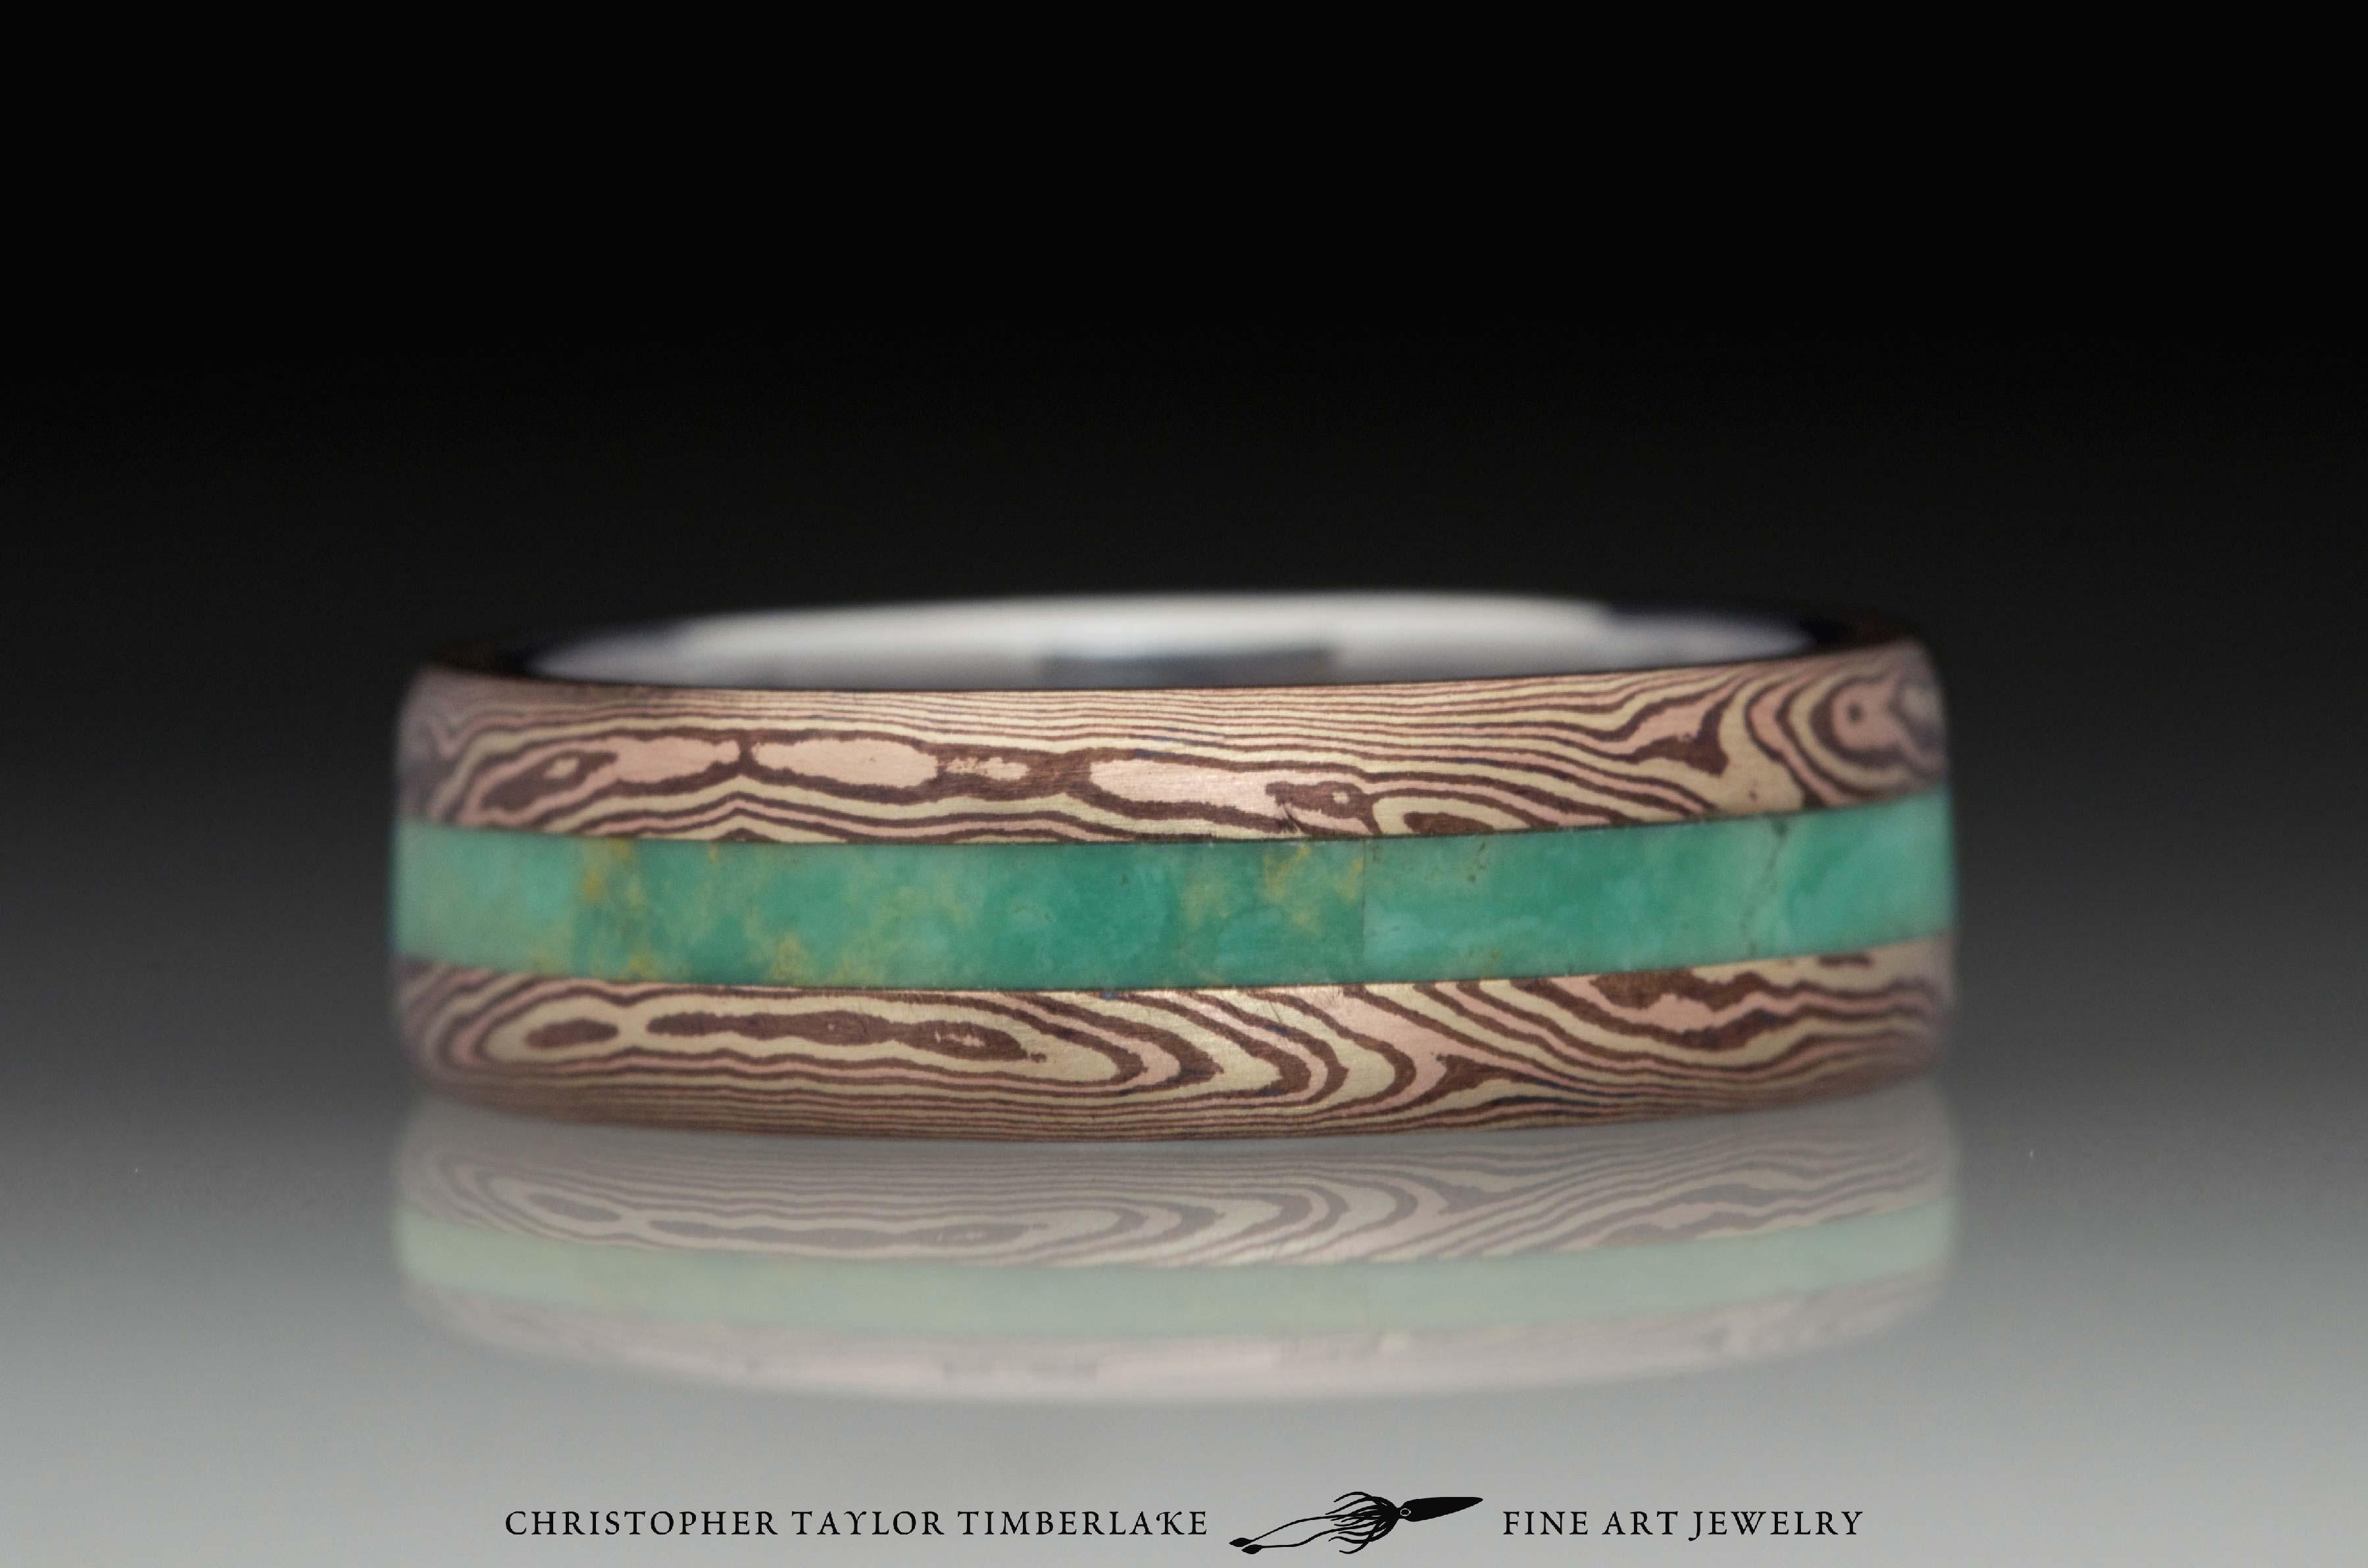 Mokumé-Mokume-Gane-Ring-(M84b)-14K-karat-yellow-gold,-14K-rose-gold,-shakudo-2k,-green-turquoise-inlay,-domed,-river-flow,-stainless-inner-band,-6mm-(2-2-2)–1